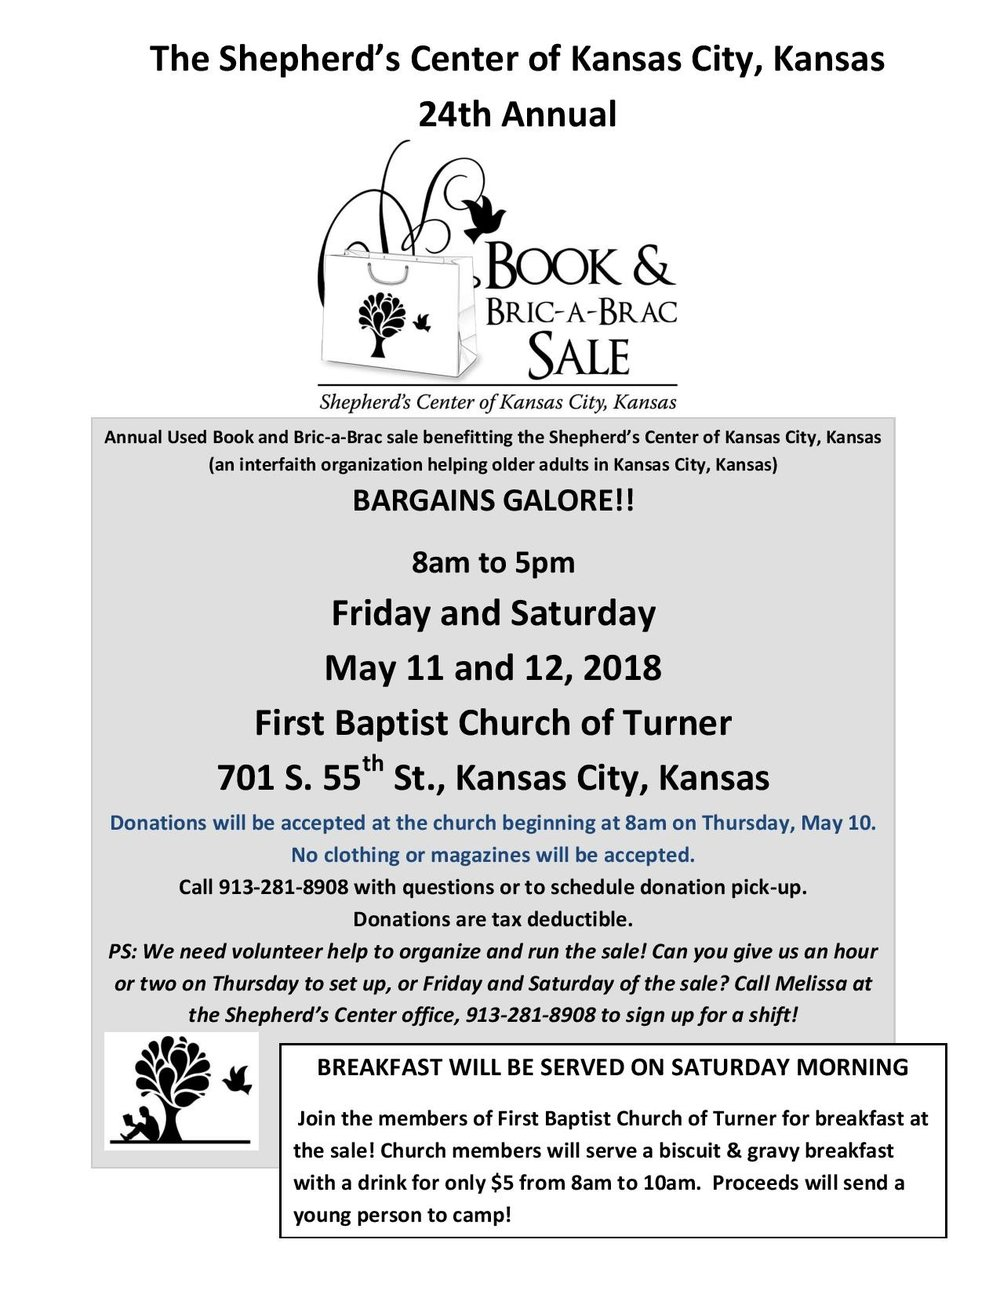 Annual Bric-a-Brac Sale_Shepherd's Center of Kansas City, Kansas.jpg